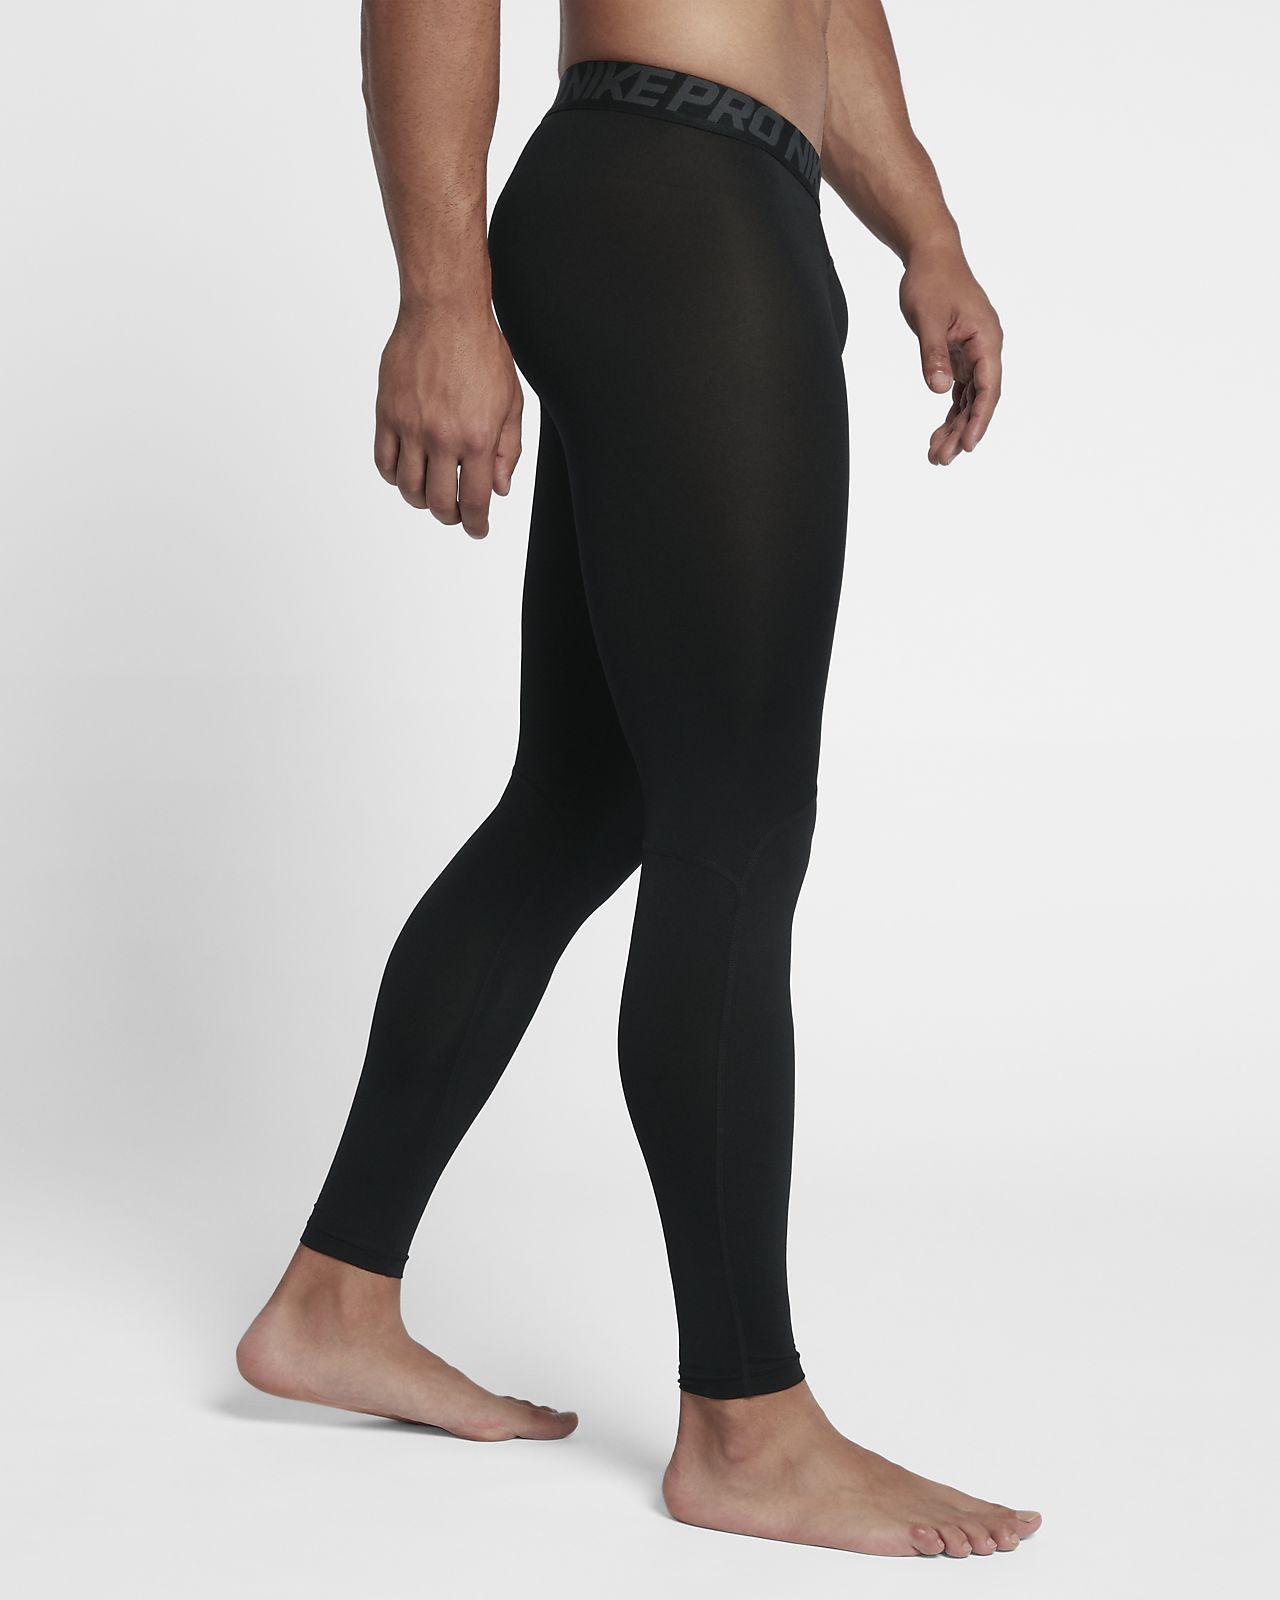 b7fa7d76d574f Low Resolution Nike Pro Men's Tights Nike Pro Men's Tights